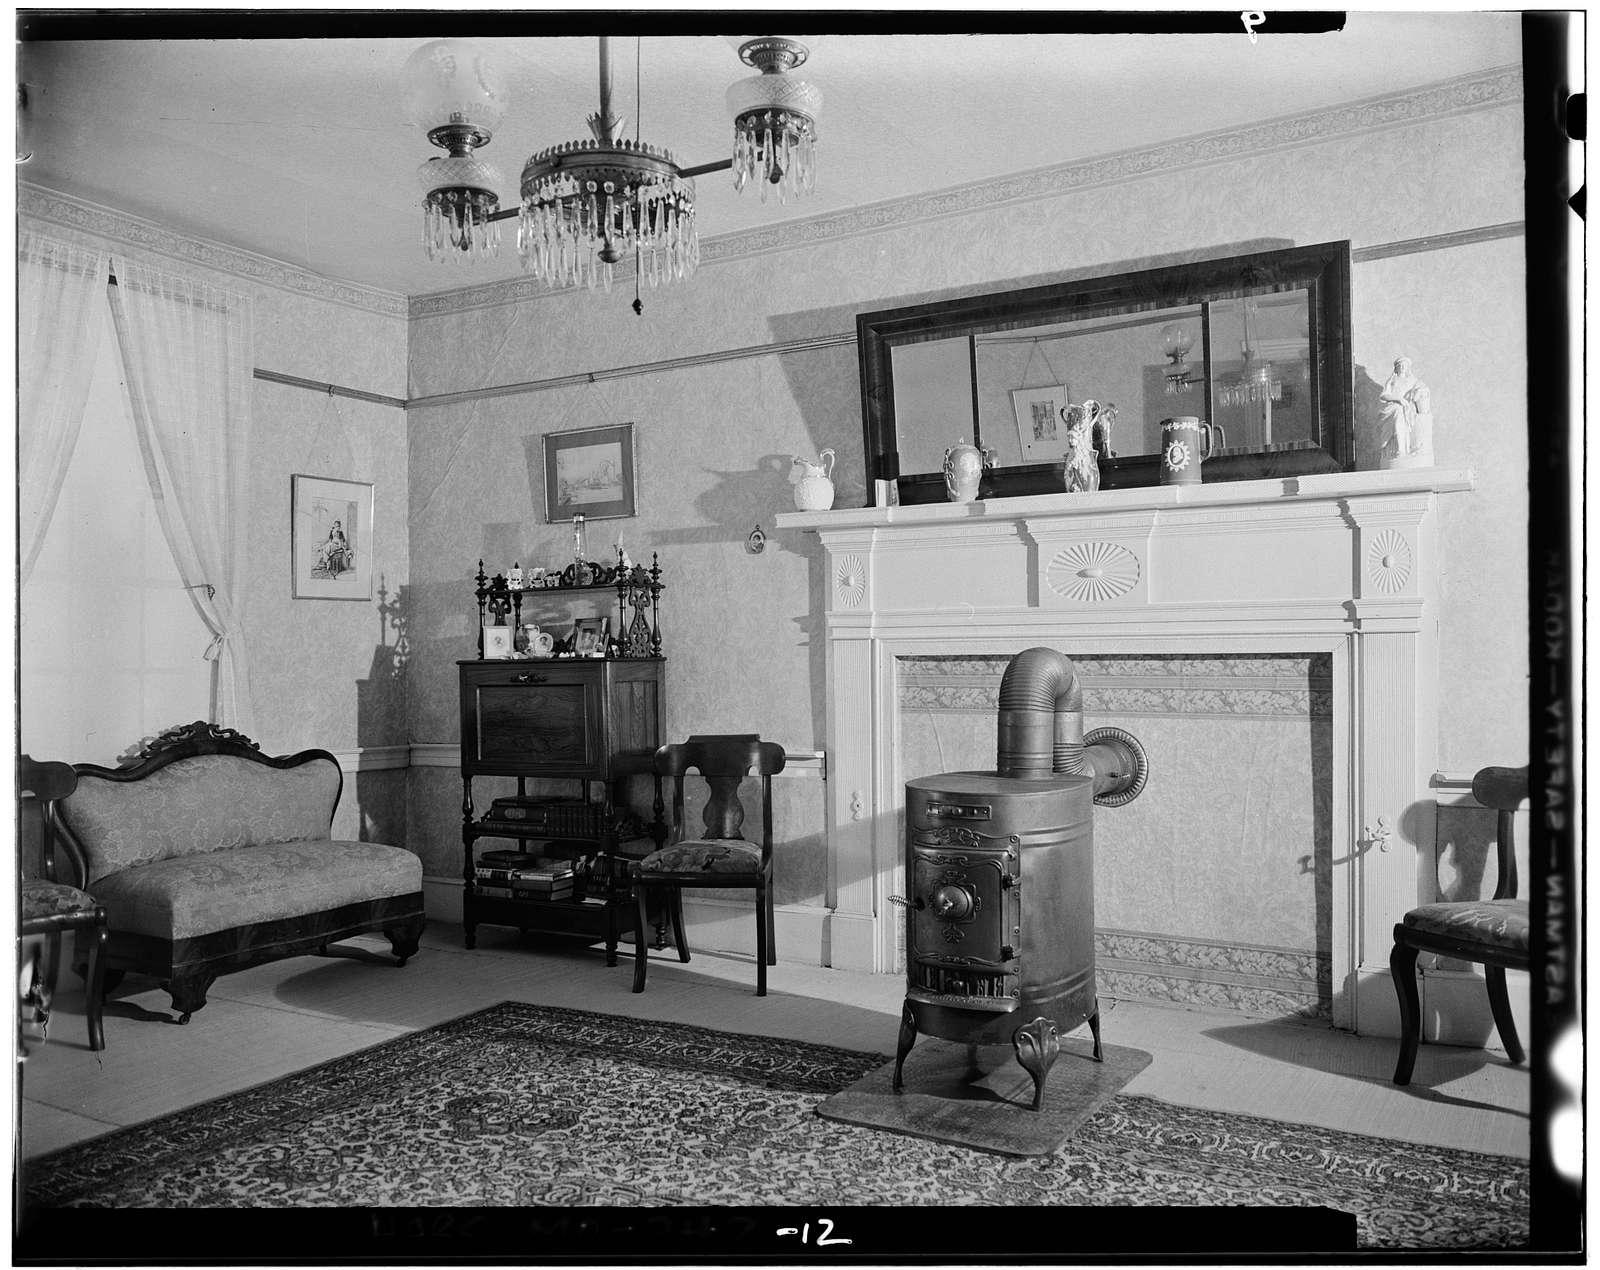 Talton Turner House, Glasgow, Howard County, MO